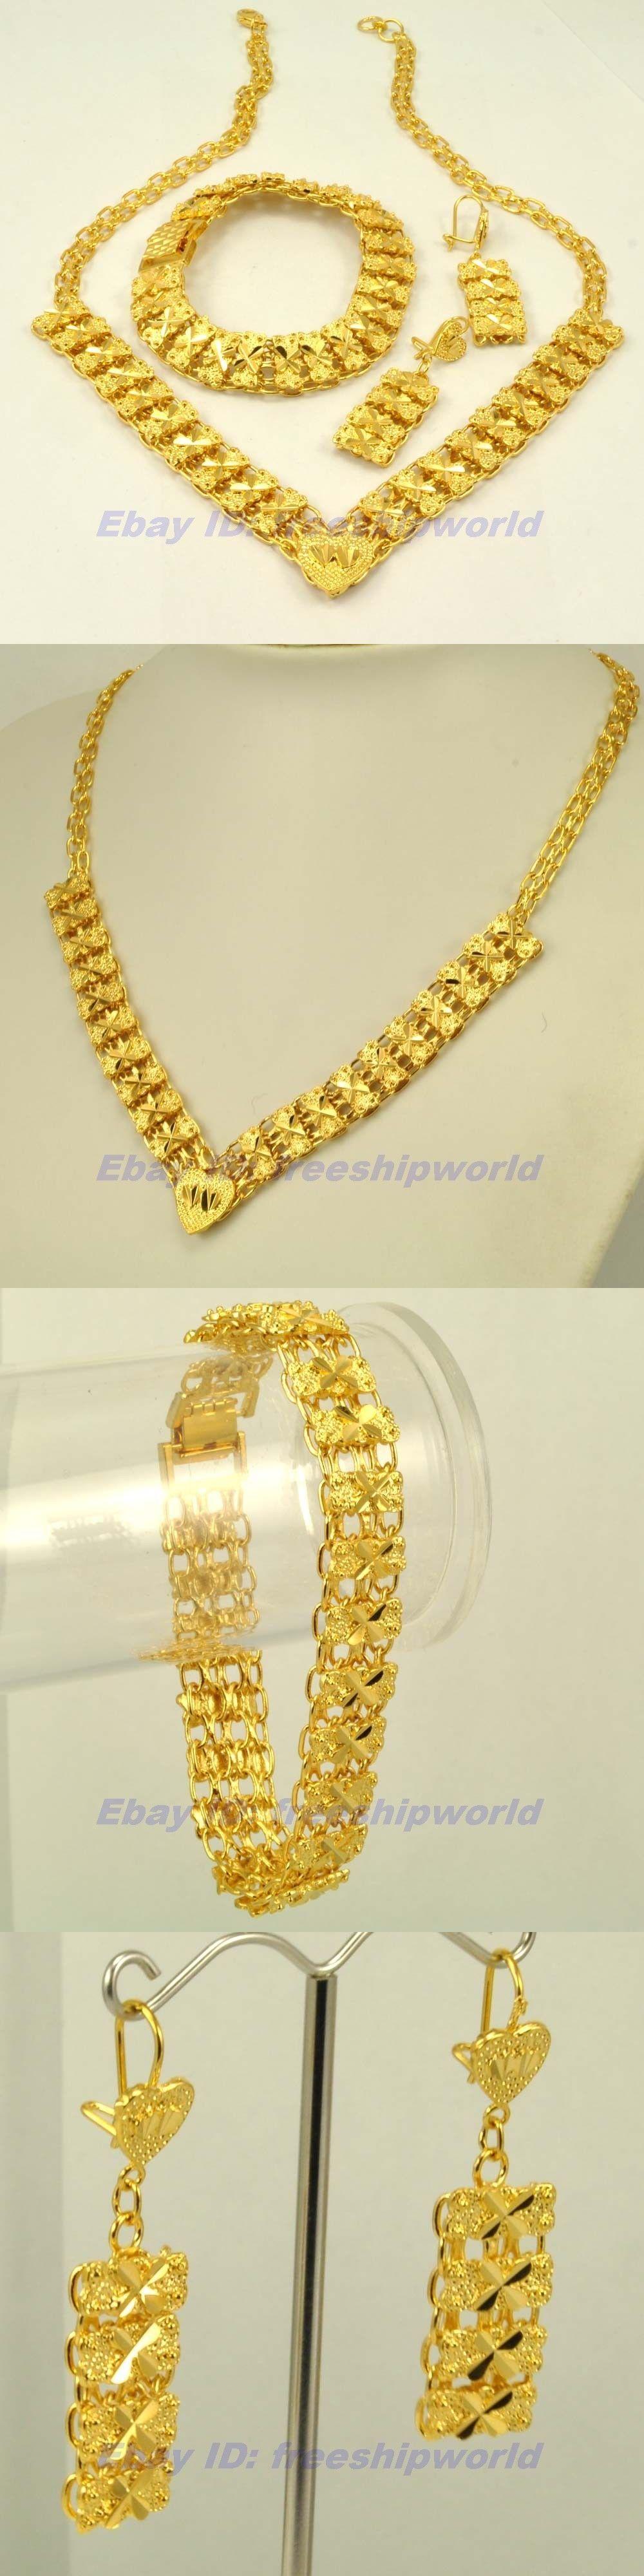 Set wholesale real k yellow gold gp set necklace bracelet earring